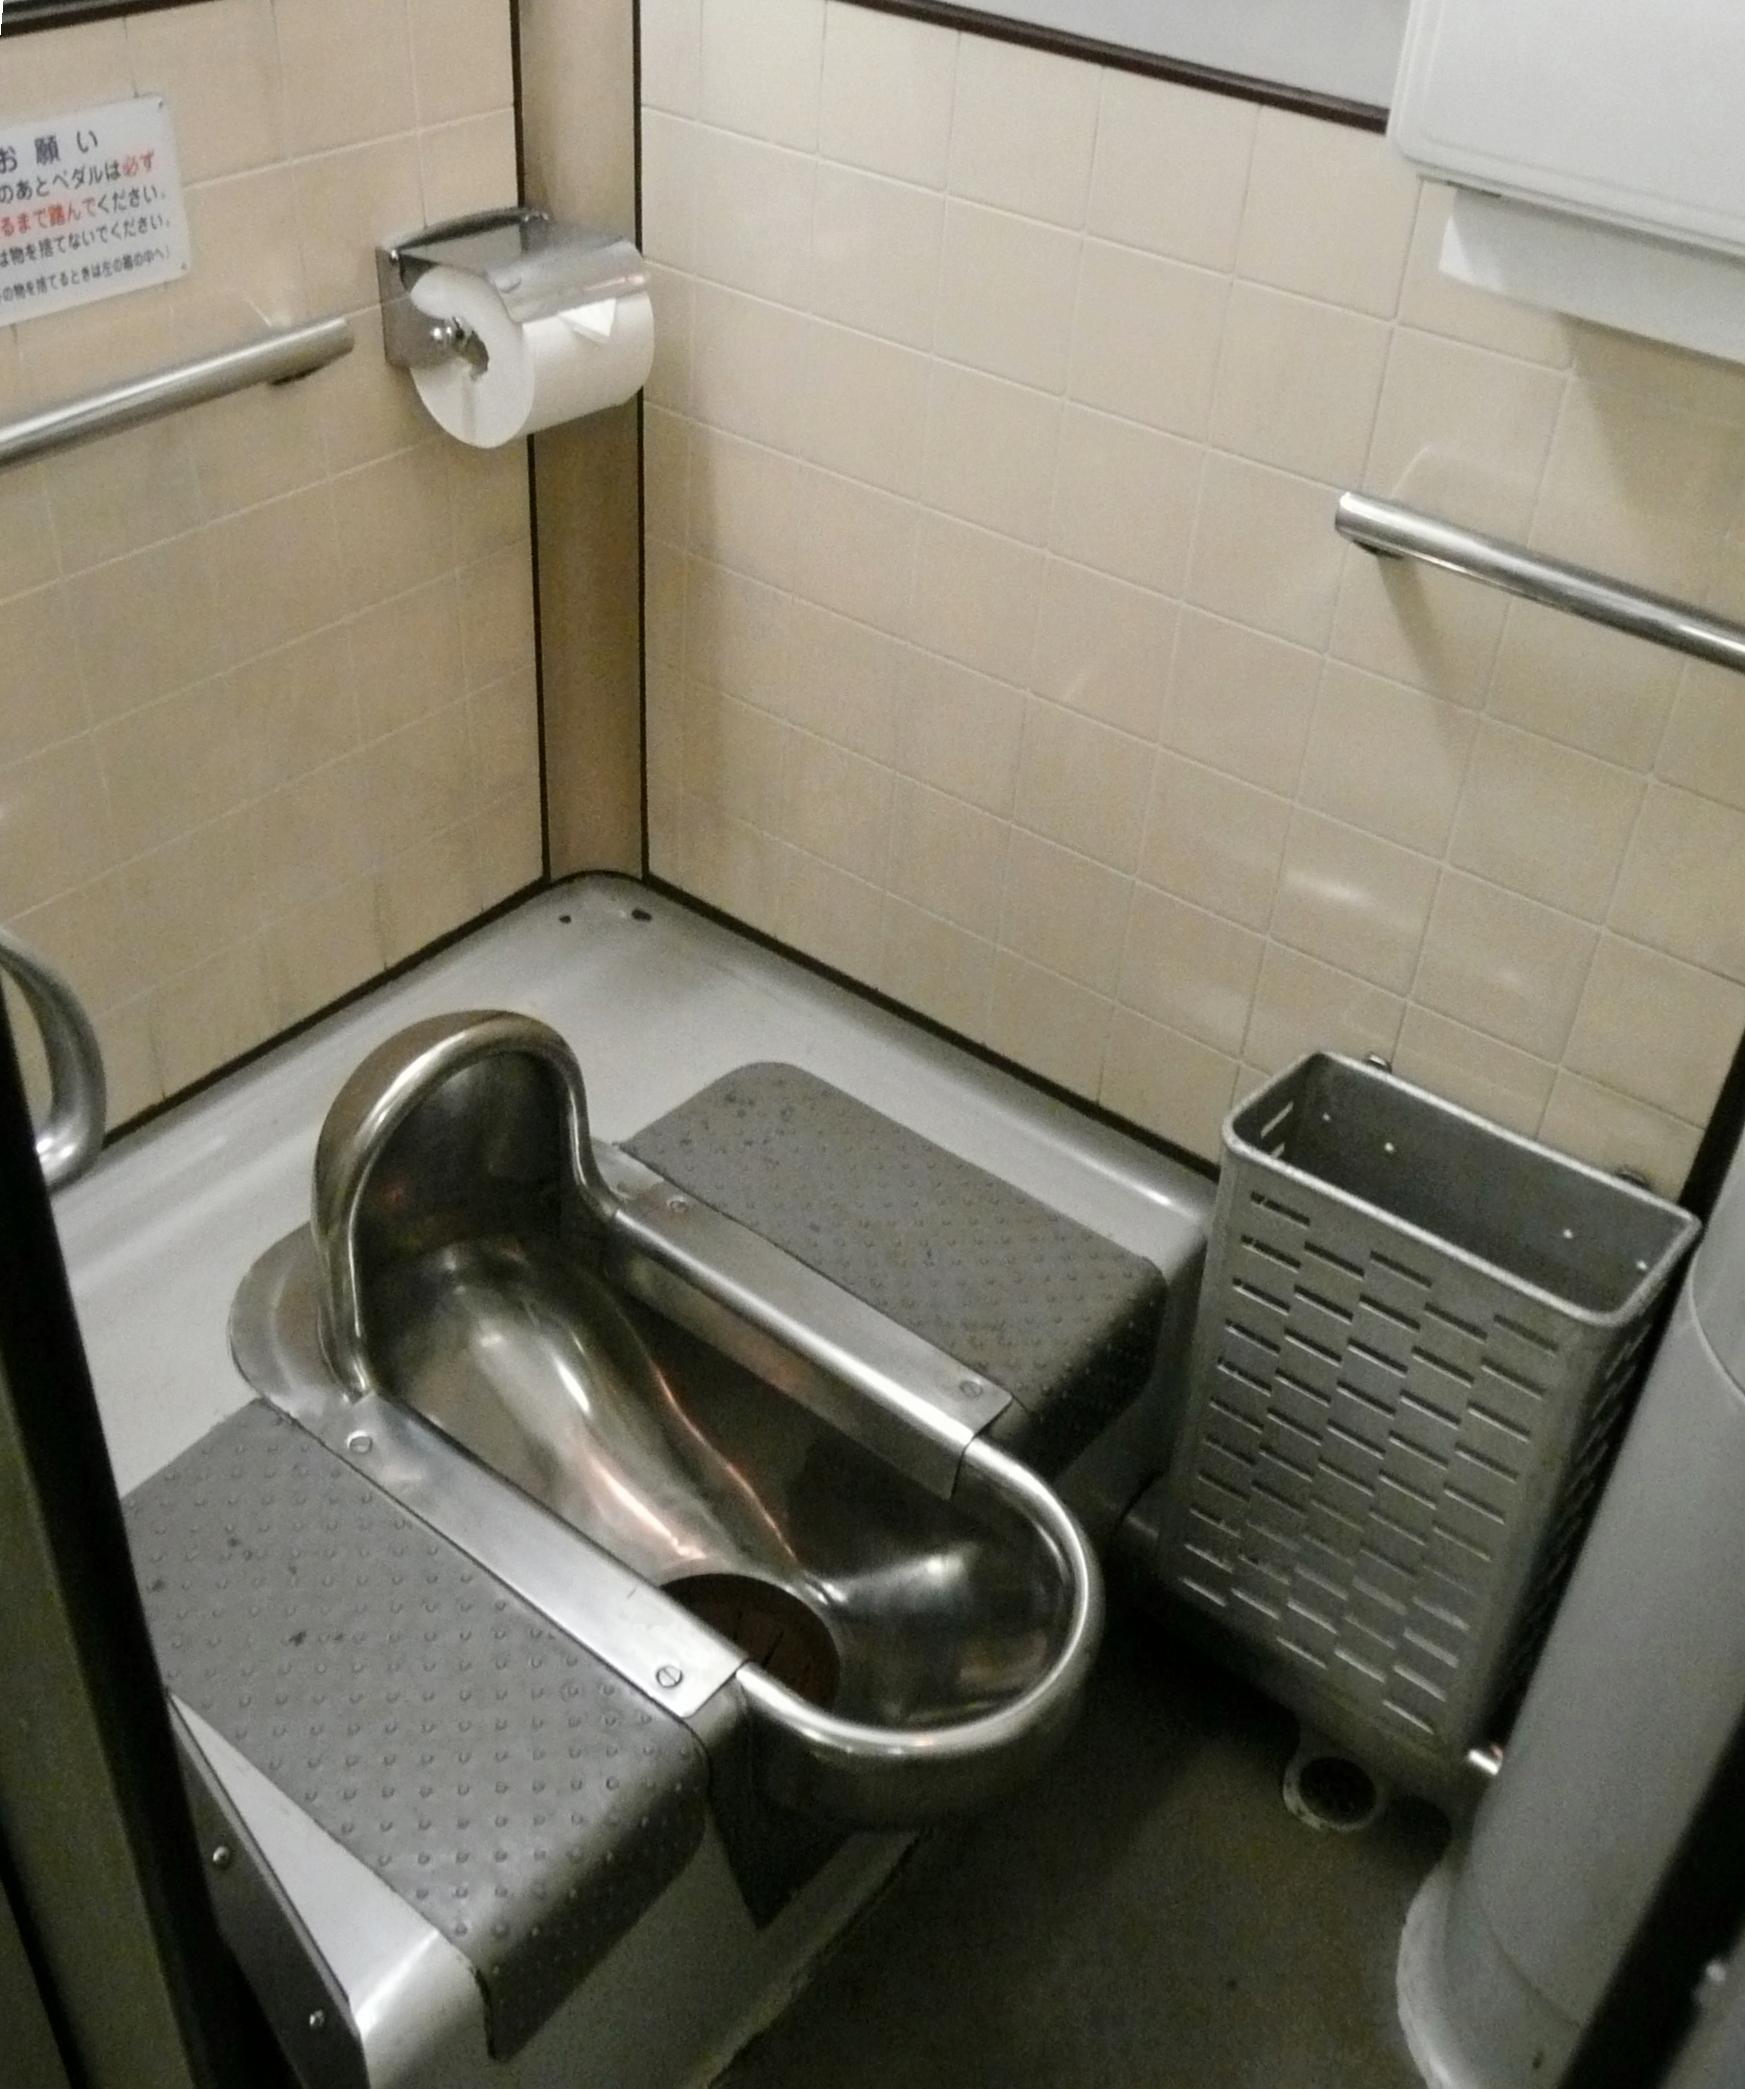 File ginga train japanese style wikimedia commons - Foto toilet ...